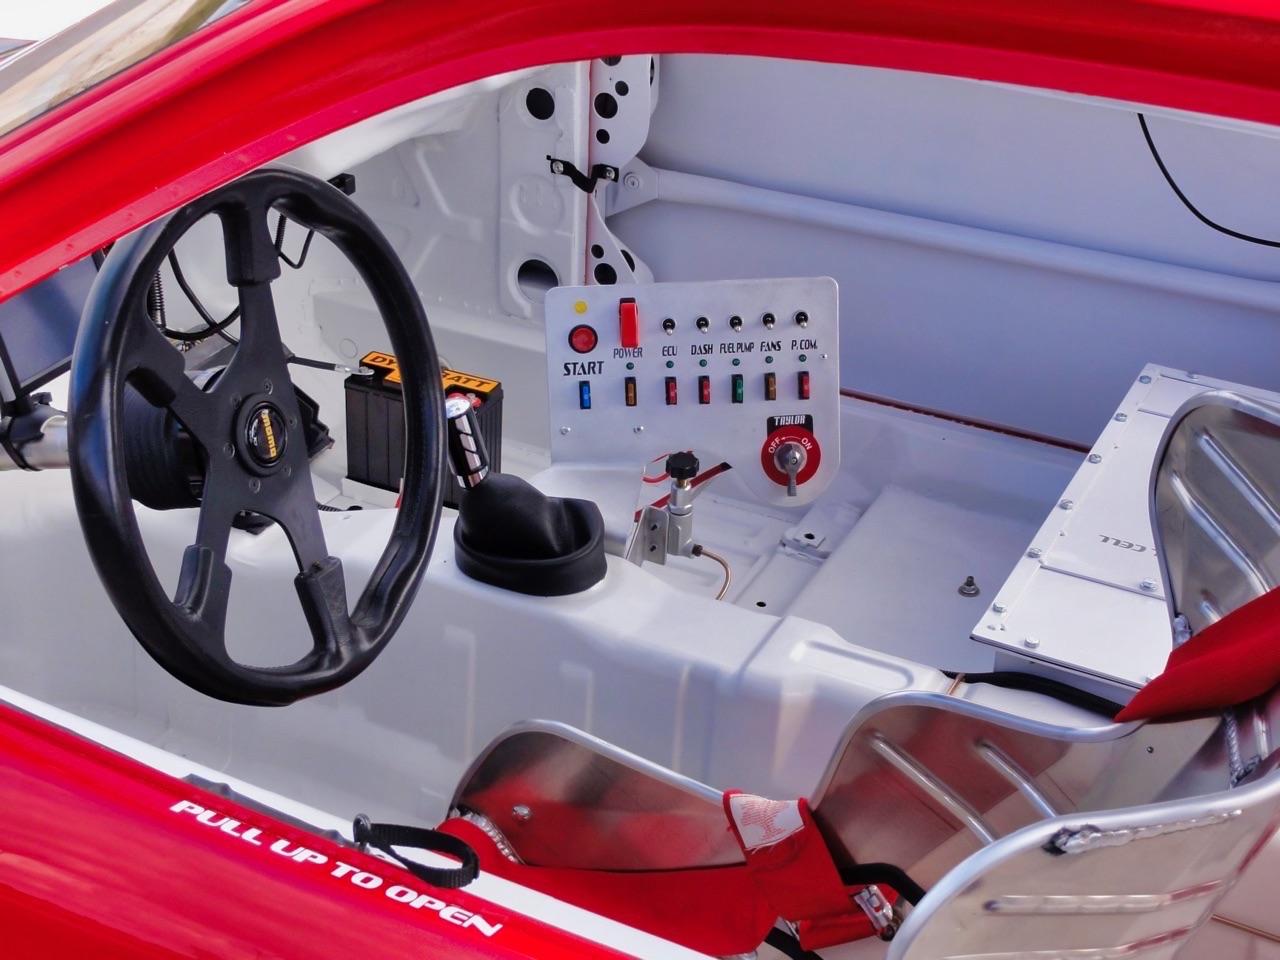 '87 Porsche 944 Widerstandsfähig, sauce BBQ ! 10